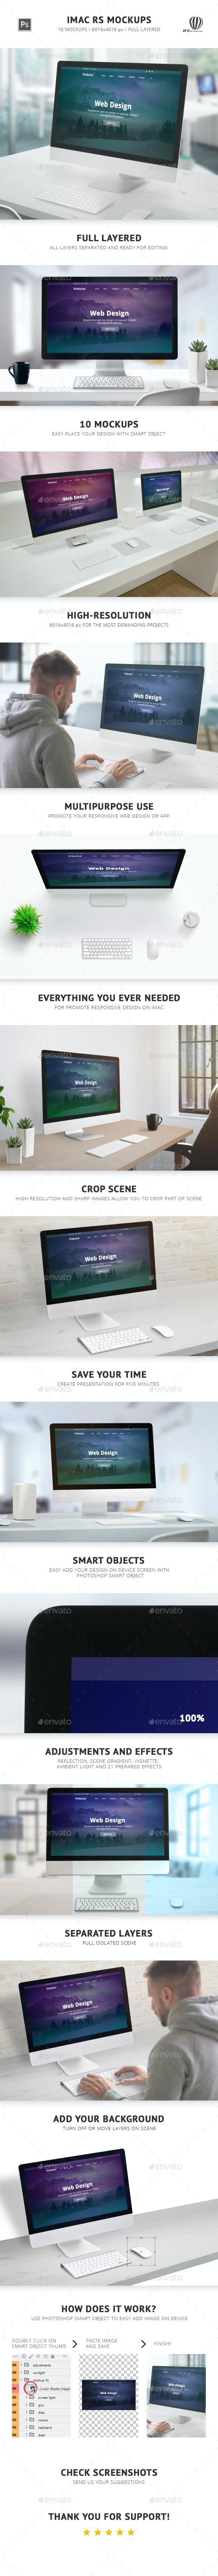 iMac RS Mockups - Monitors Displays